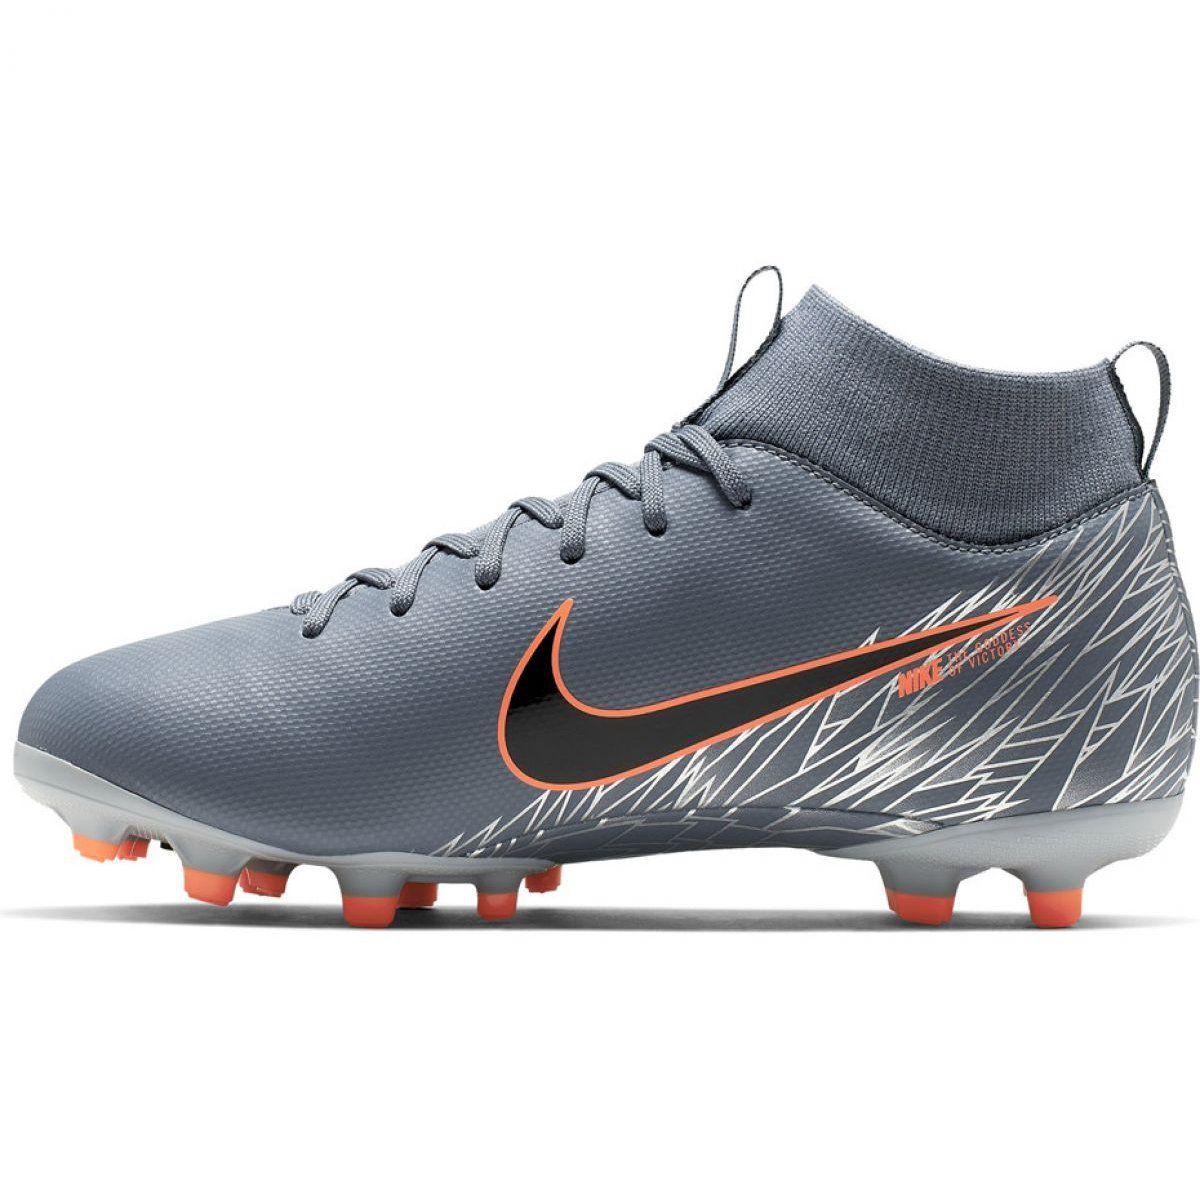 Buty Pilkarskie Nike Mercurial Superfly 6 Academy Mg Jr Ah7337 408 Wielokolorowe Szare Football Shoes Boys Football Boots Superfly